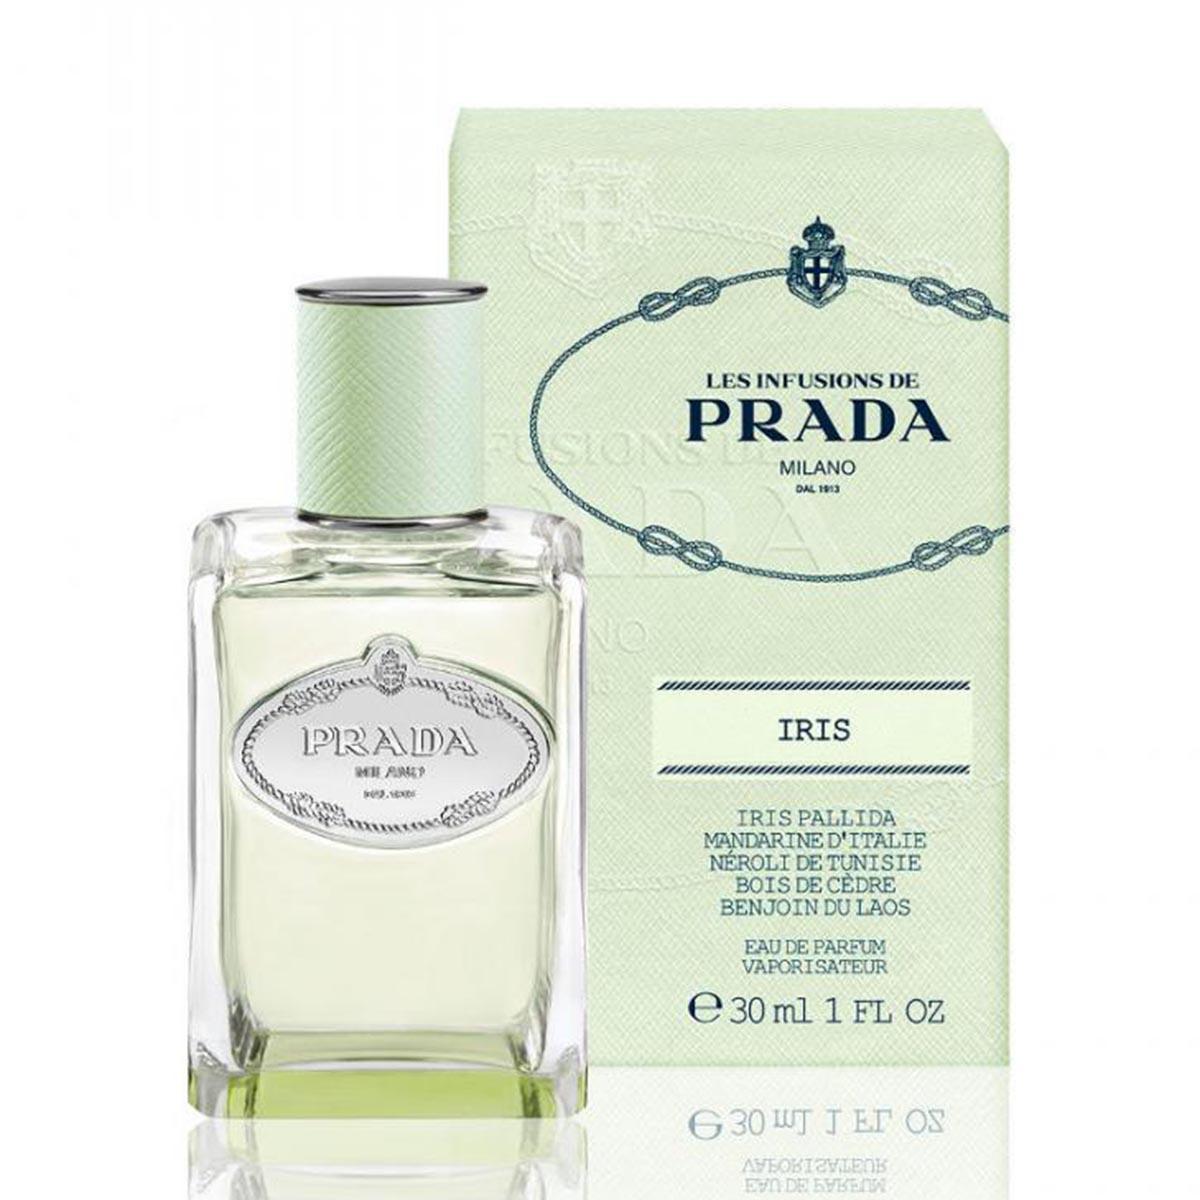 Prada infusion d iris eau de parfum 30ml vaporizador